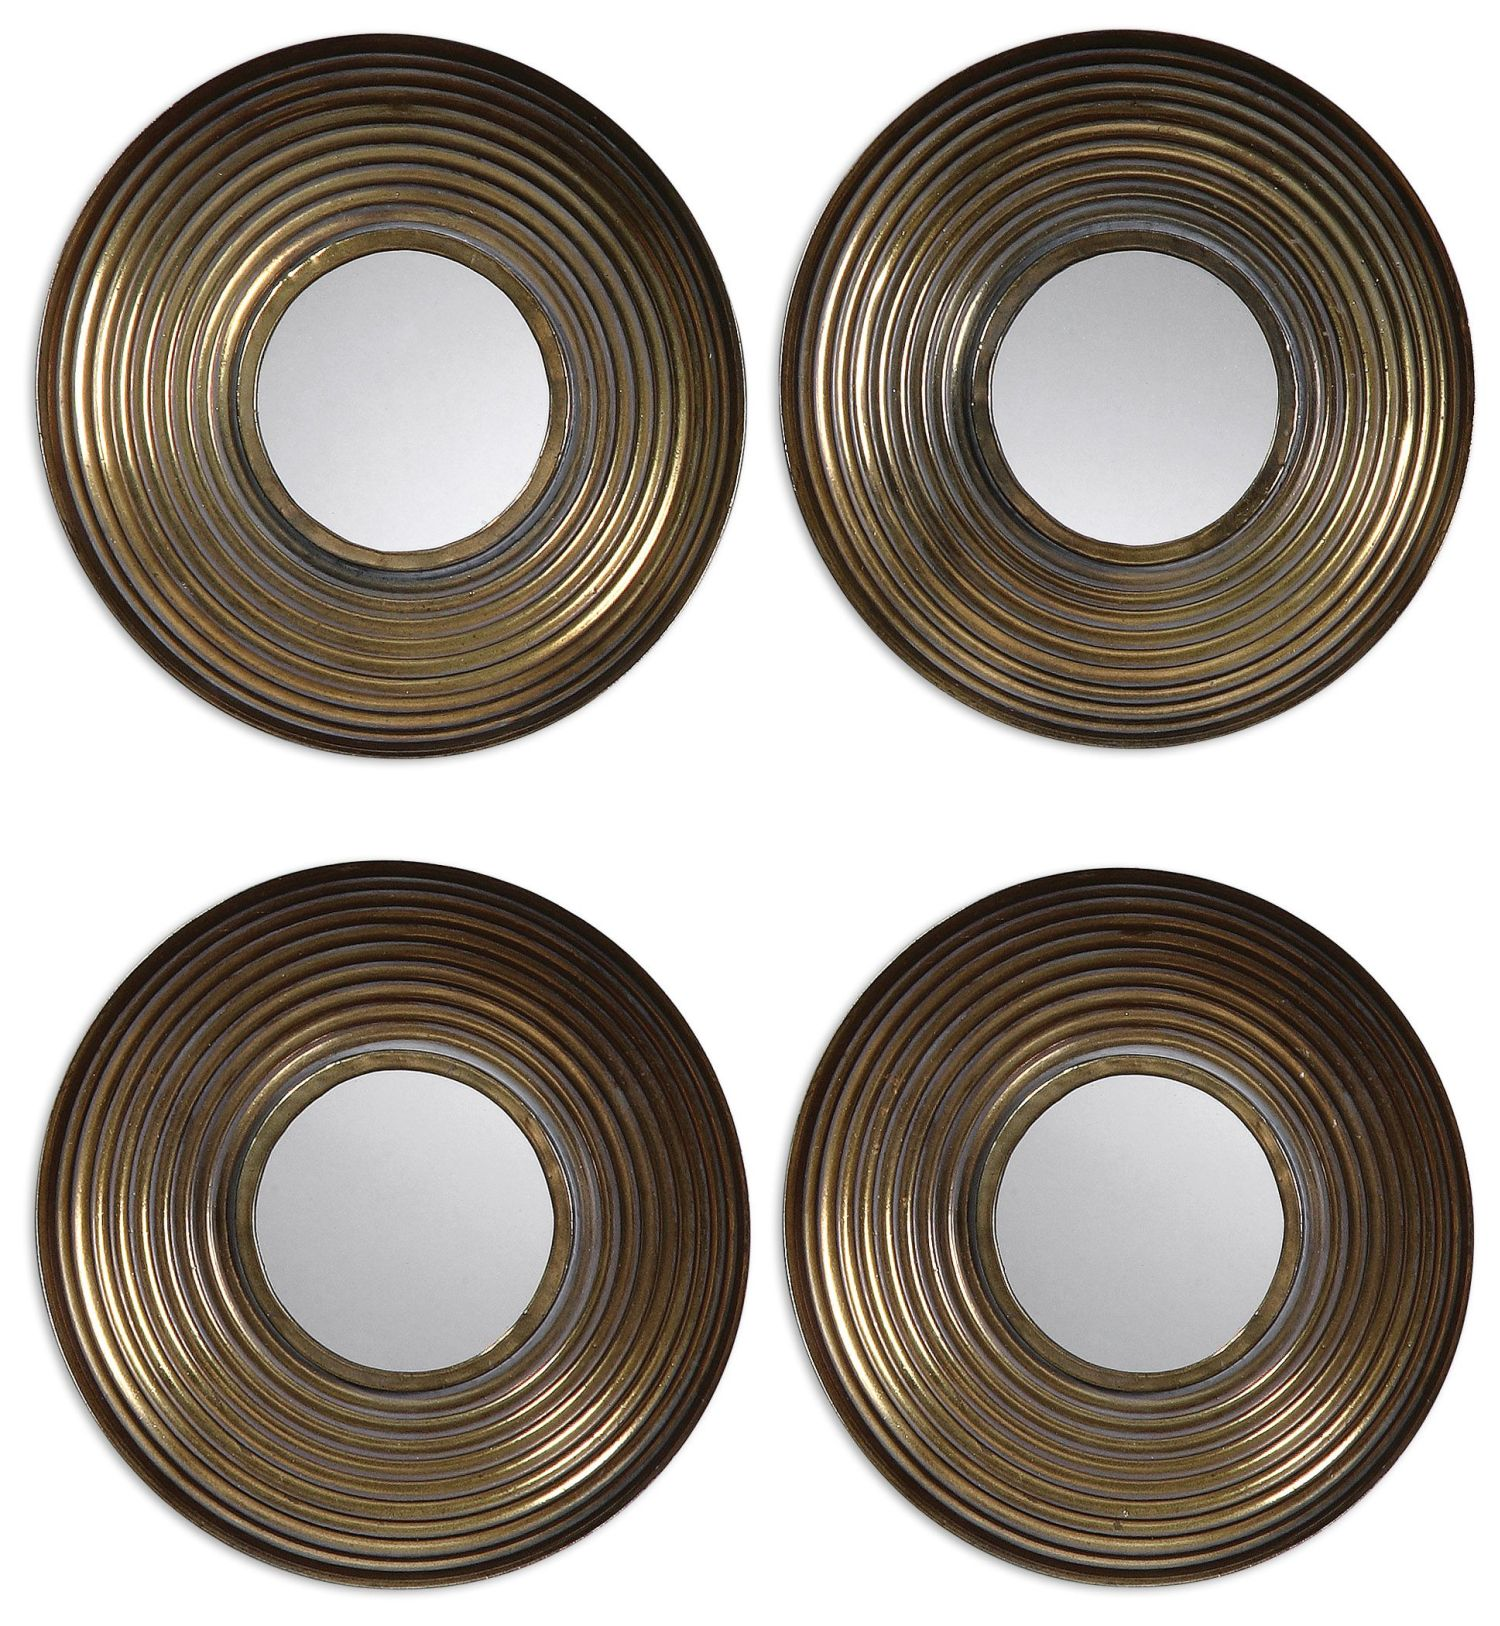 Uttermost 12858 Tondela Round Mirrors Set/4